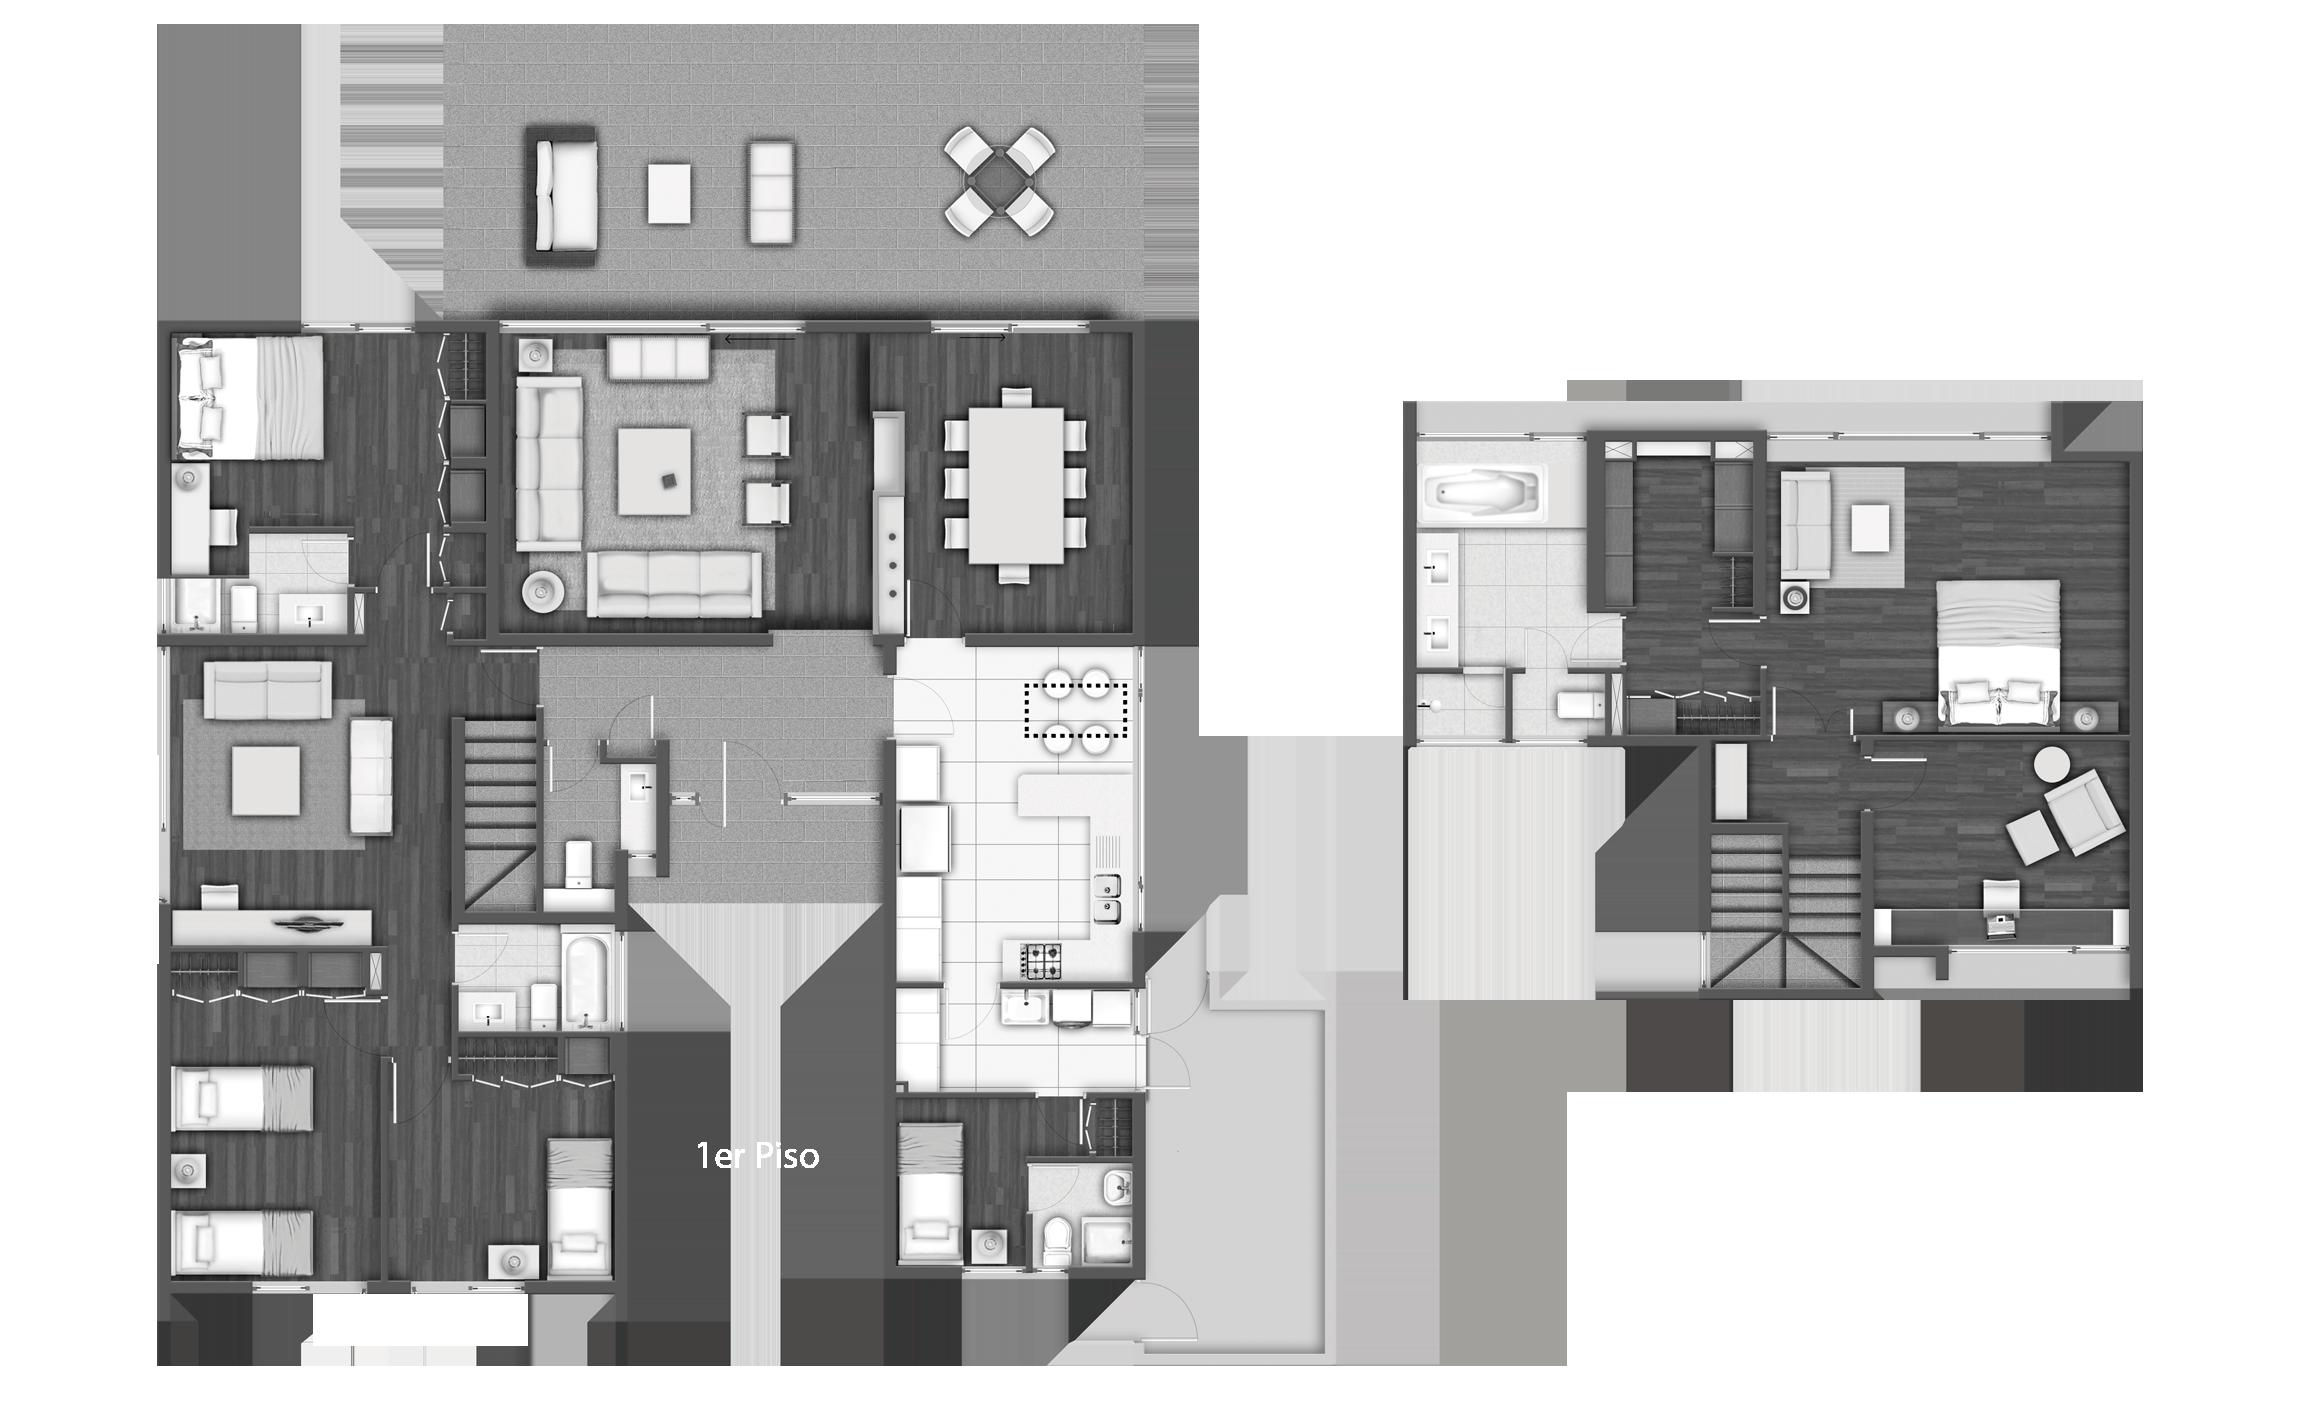 Aguapiedra planos casas pinterest planos casas for Casa clasica procrear terminada